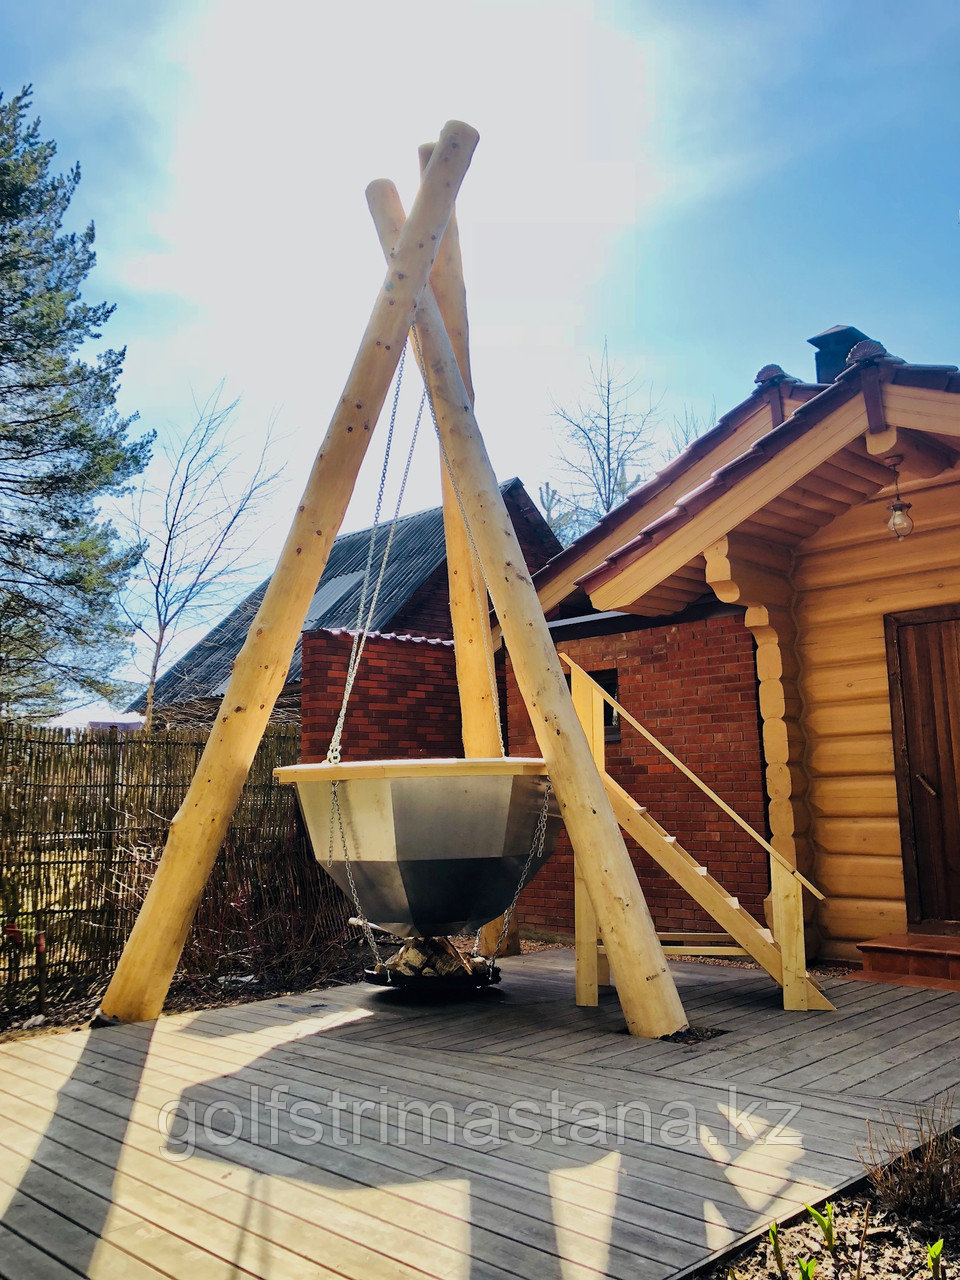 Сибирский Банный Чан, (в*д: 110*165/0,3 см., AISI-304), На бревнах, без печи